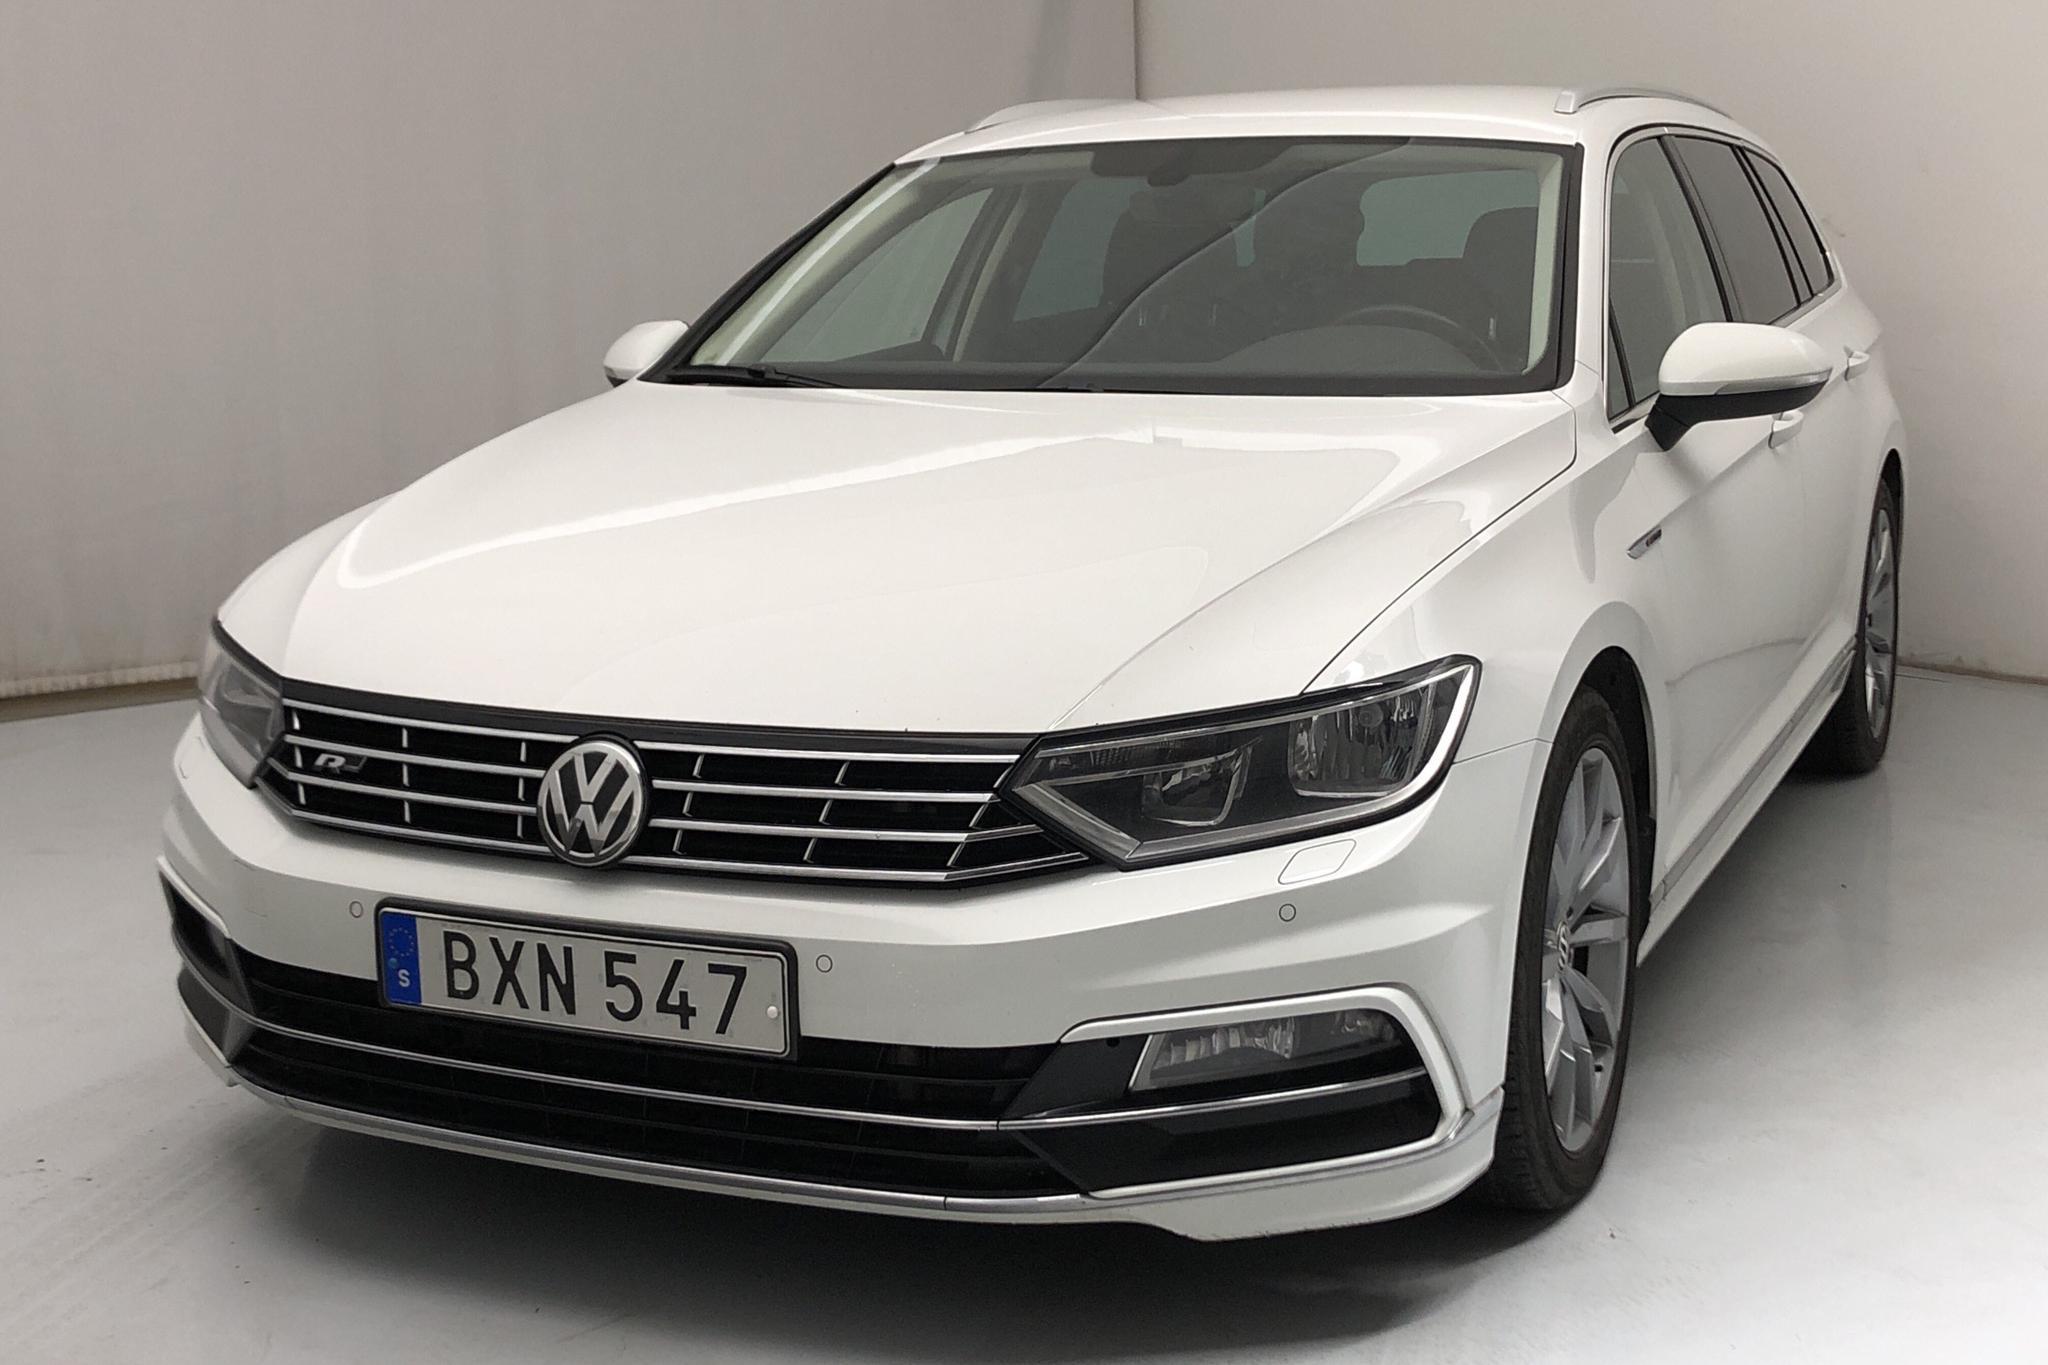 VW Passat 2.0 TDI Sportscombi 4MOTION (190hk) - 169 190 km - Automatic - white - 2017